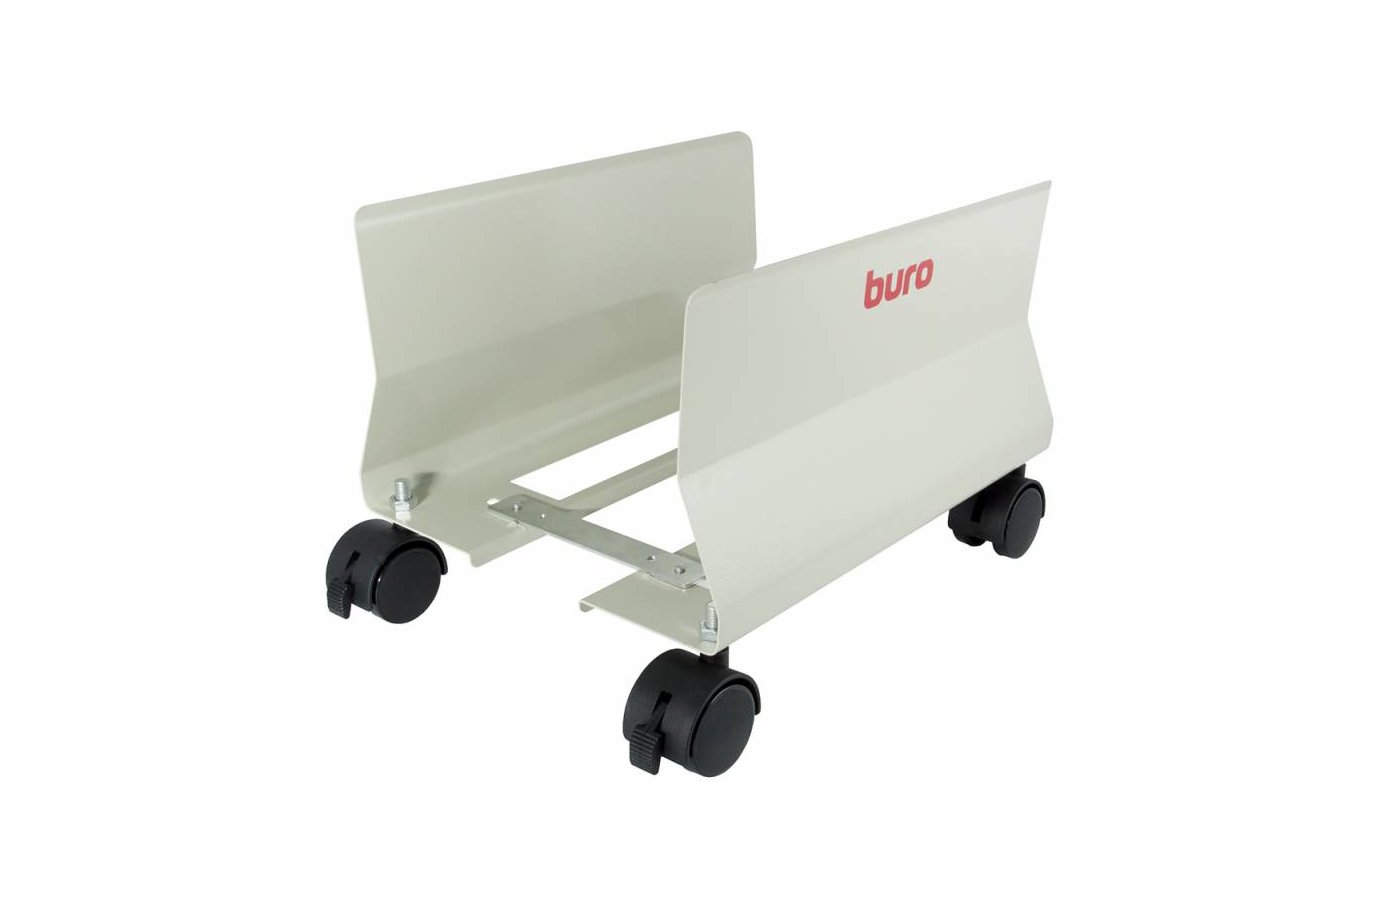 BURO BU-CS1AL светло-серый шир. сист. бл. 90 см - 230 см масса сист. бл. до 24 кг материал - мет